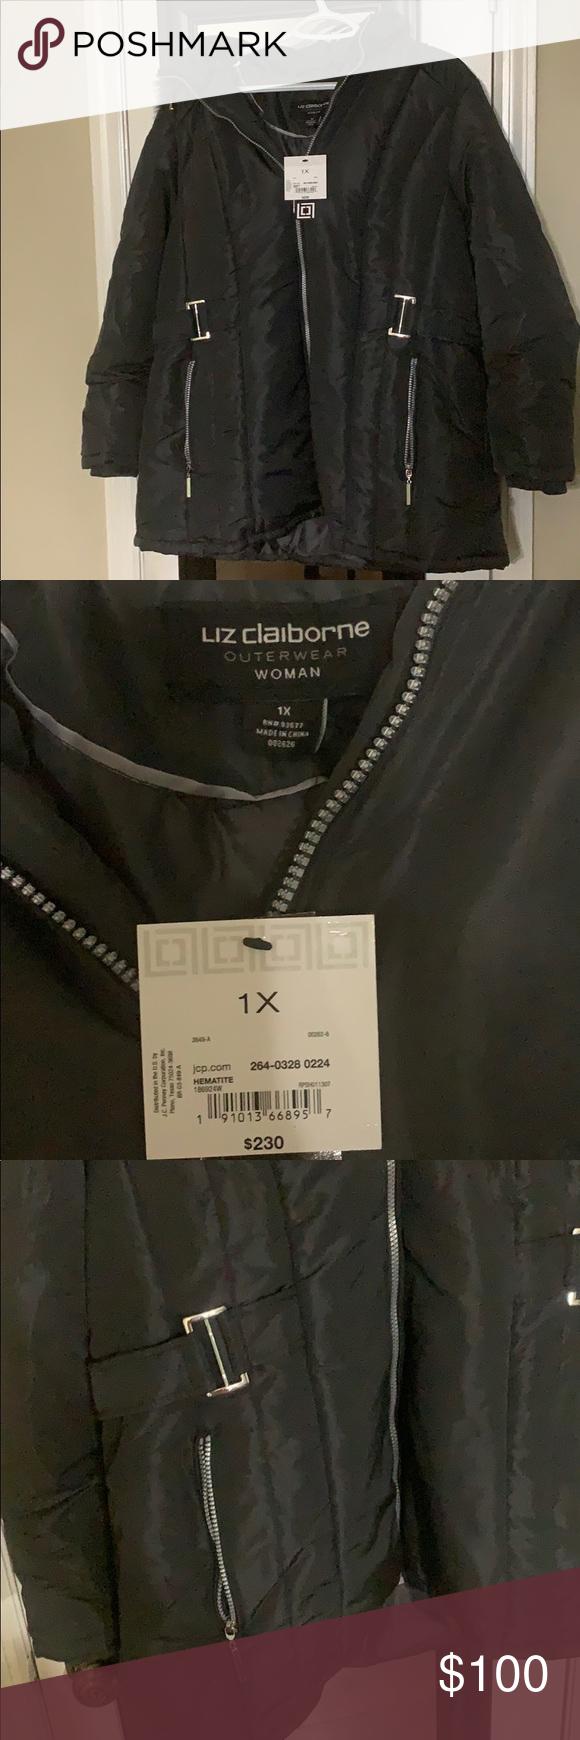 Liz Claiborne Outerwear Black Coat Black Coat Outerwear Liz Claiborne [ 1740 x 580 Pixel ]